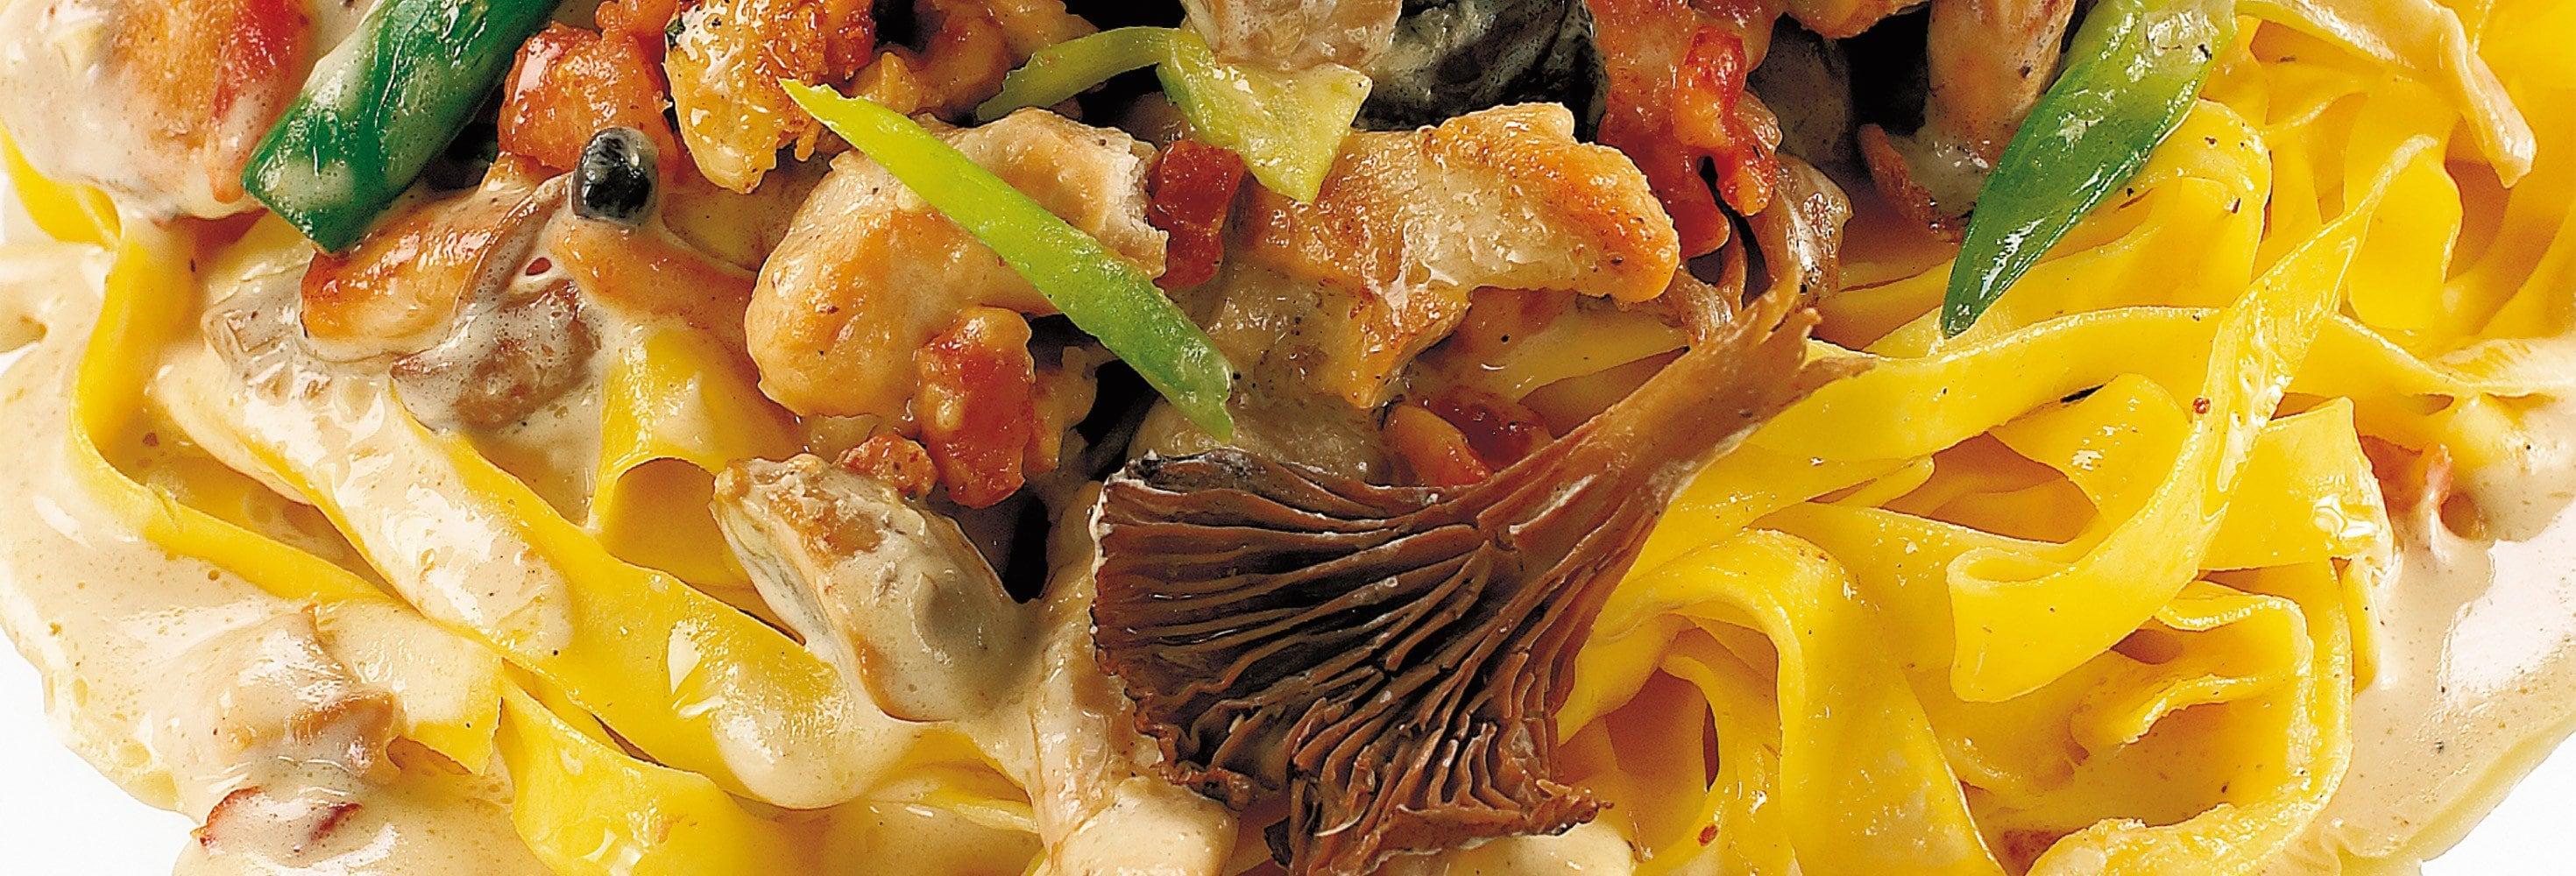 Tagliatelli met kip en boschampignons